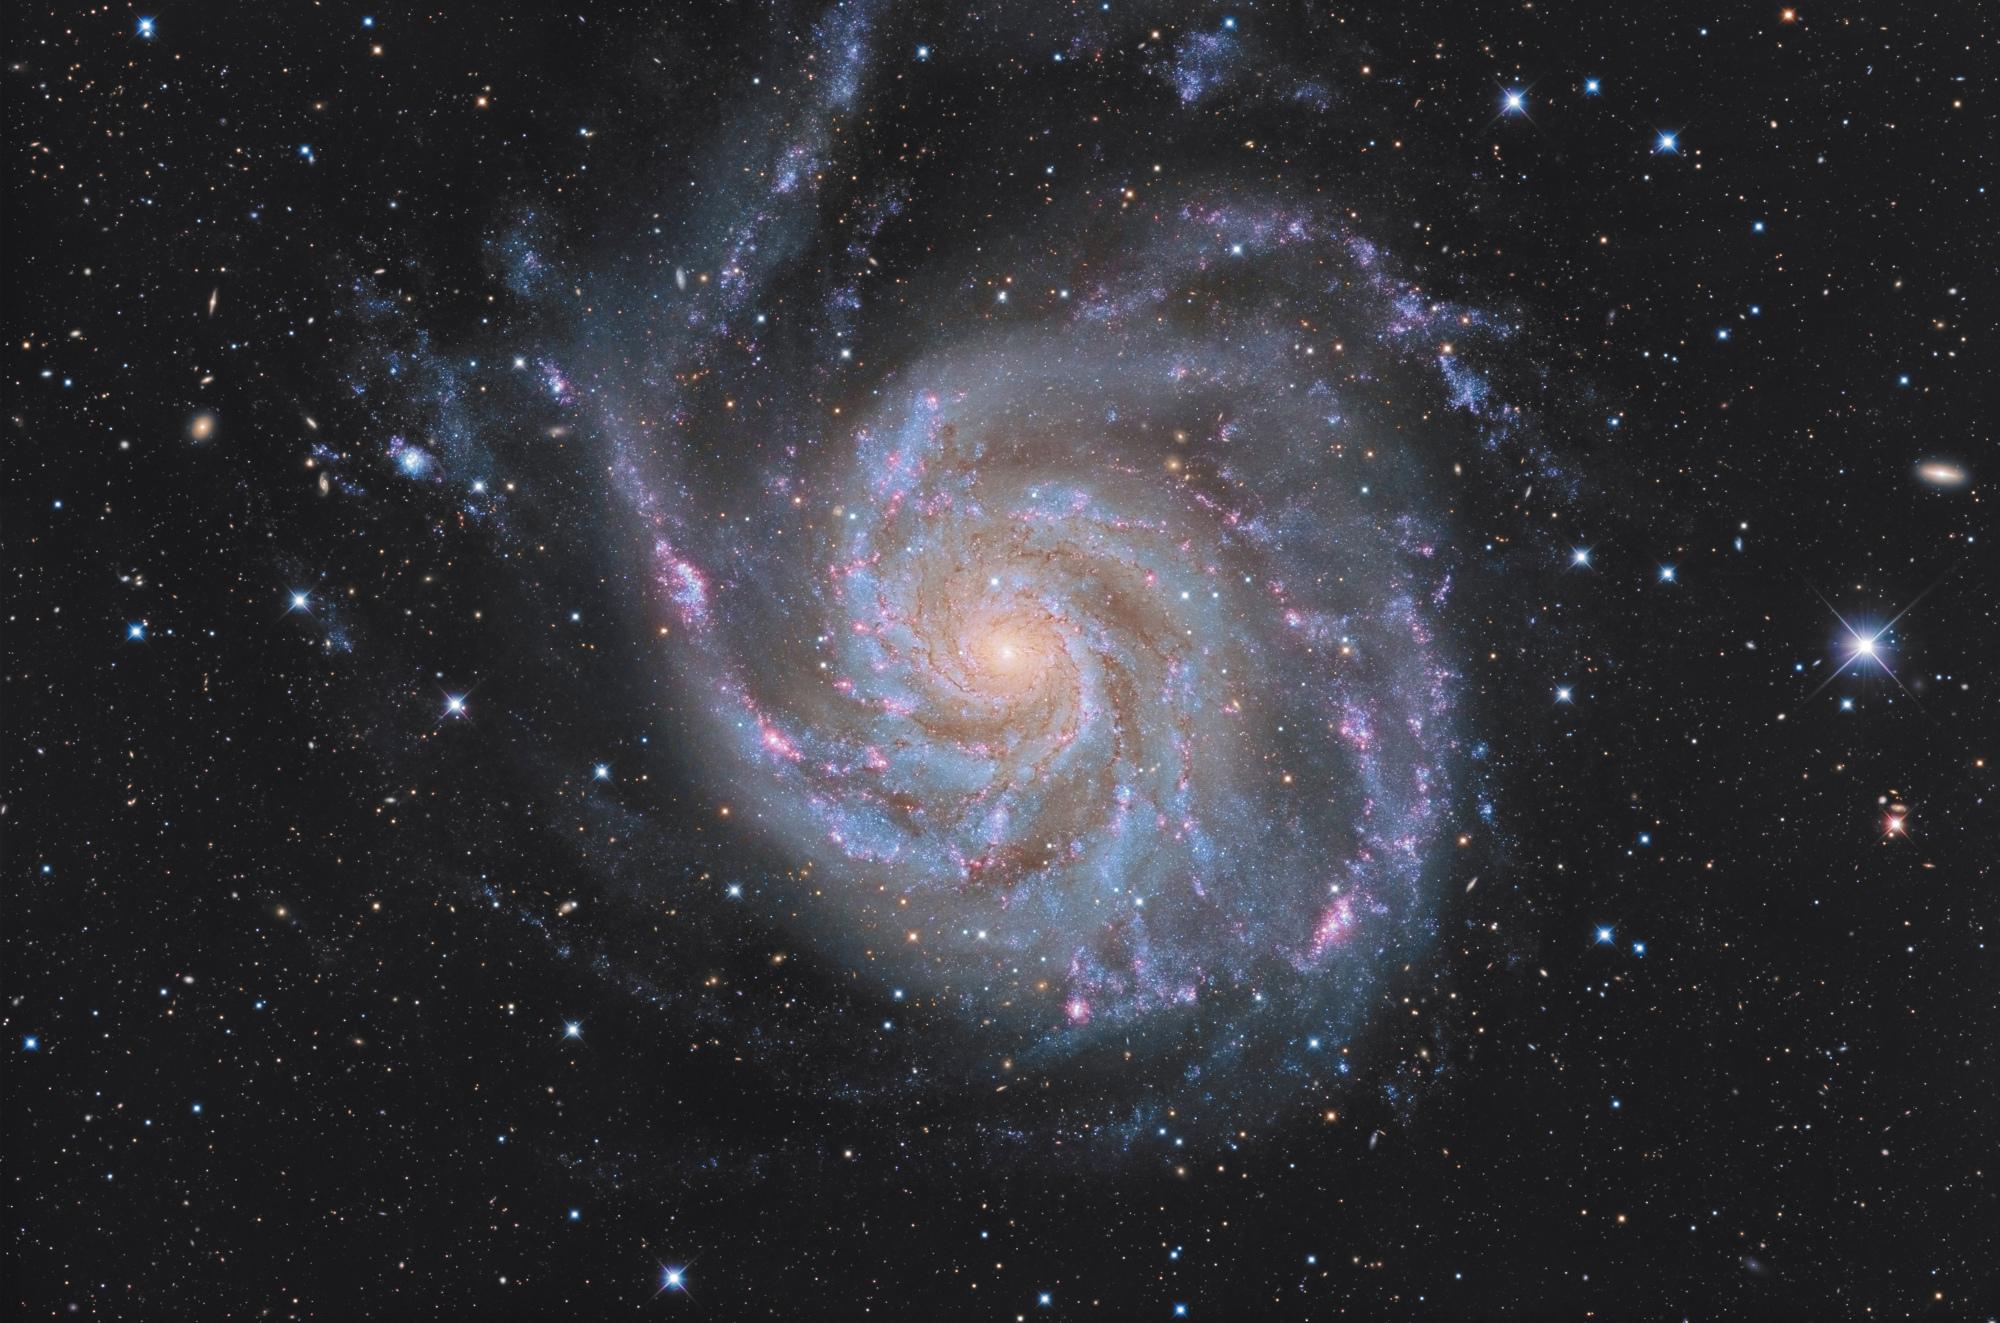 M101-final-3_web.thumb.jpg.6ecf52e6e0cfea75b8bdf5ff8cd06226.jpg